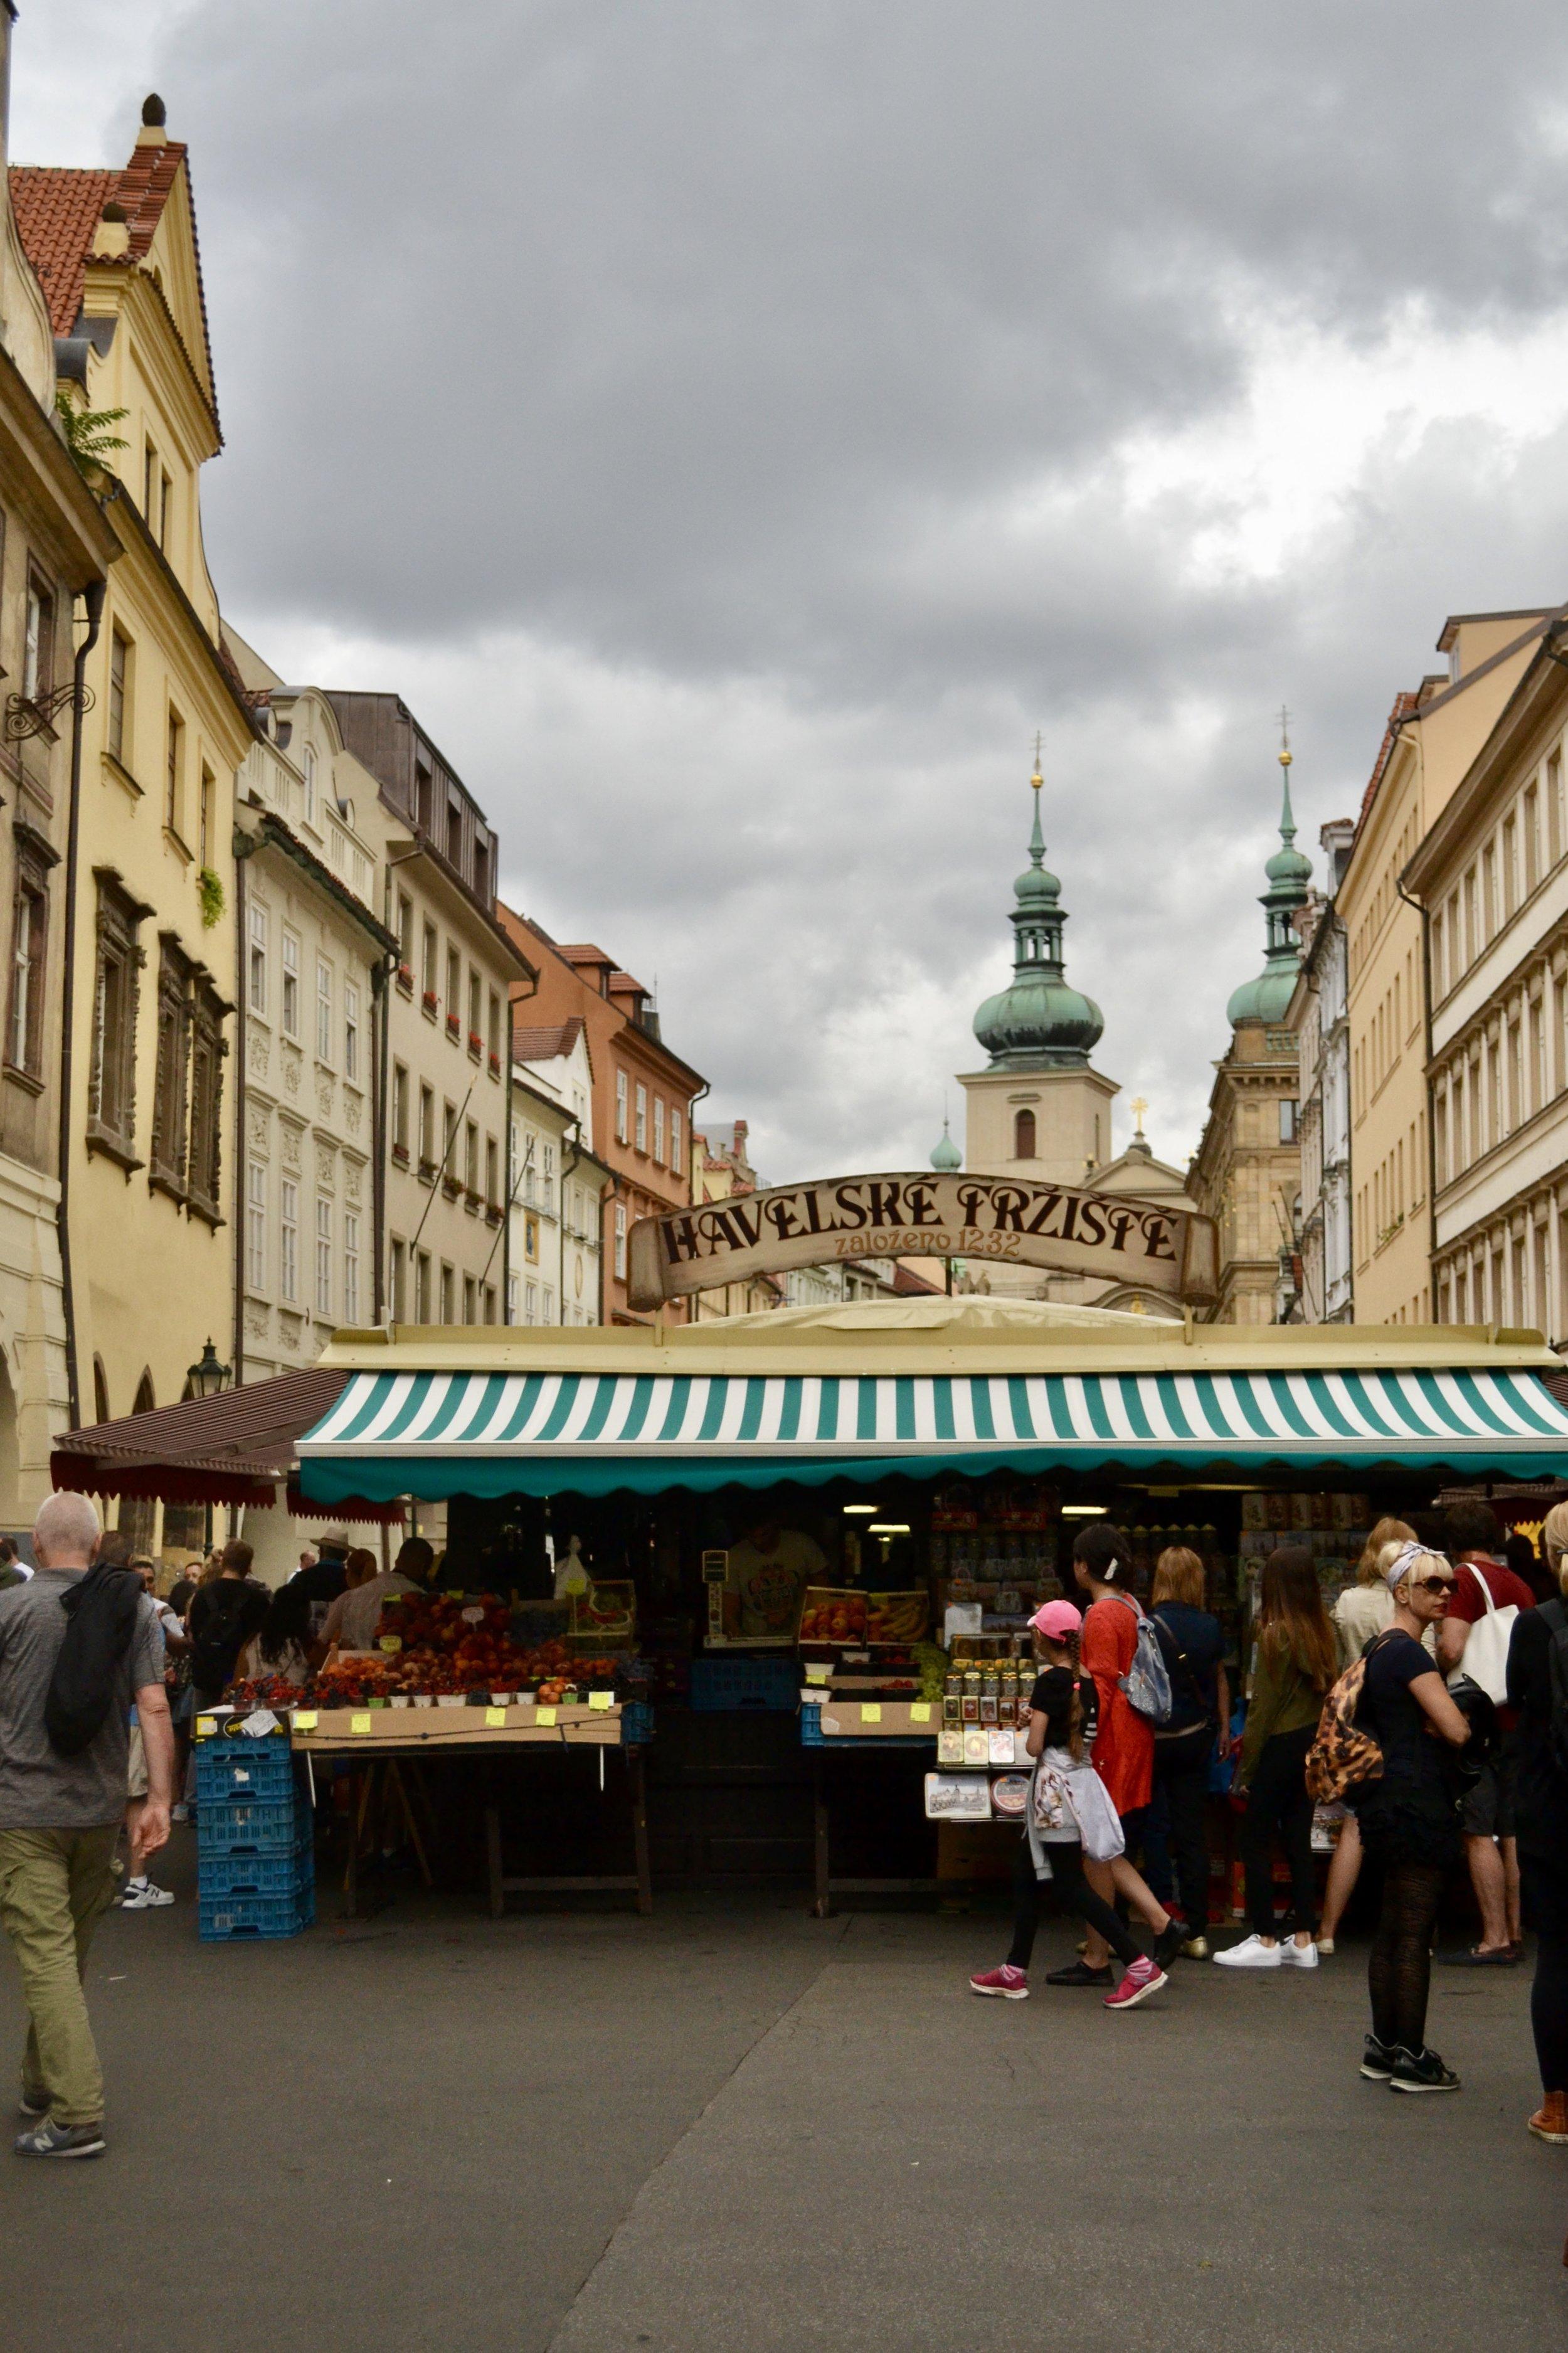 Havelská Market